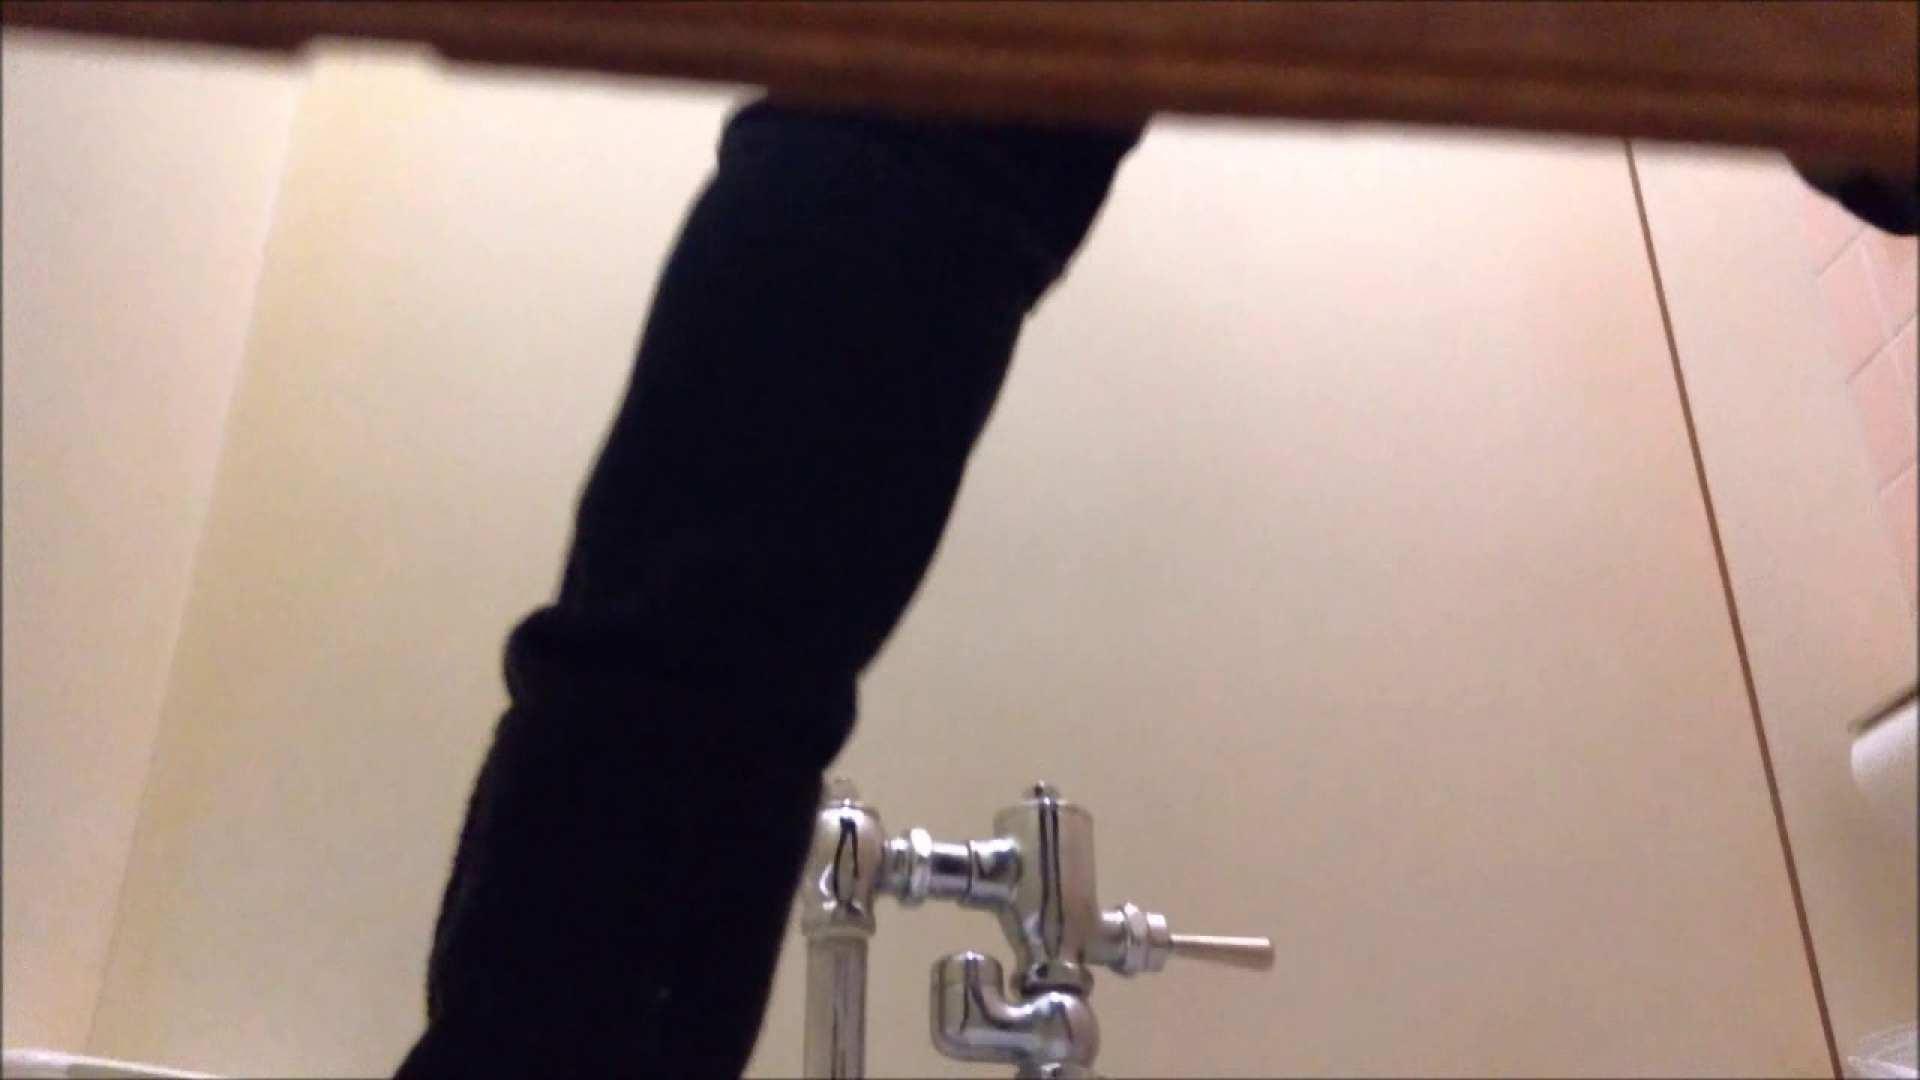 某有名大学女性洗面所 vol.12 和式・女子用 おまんこ無修正動画無料 96画像 87